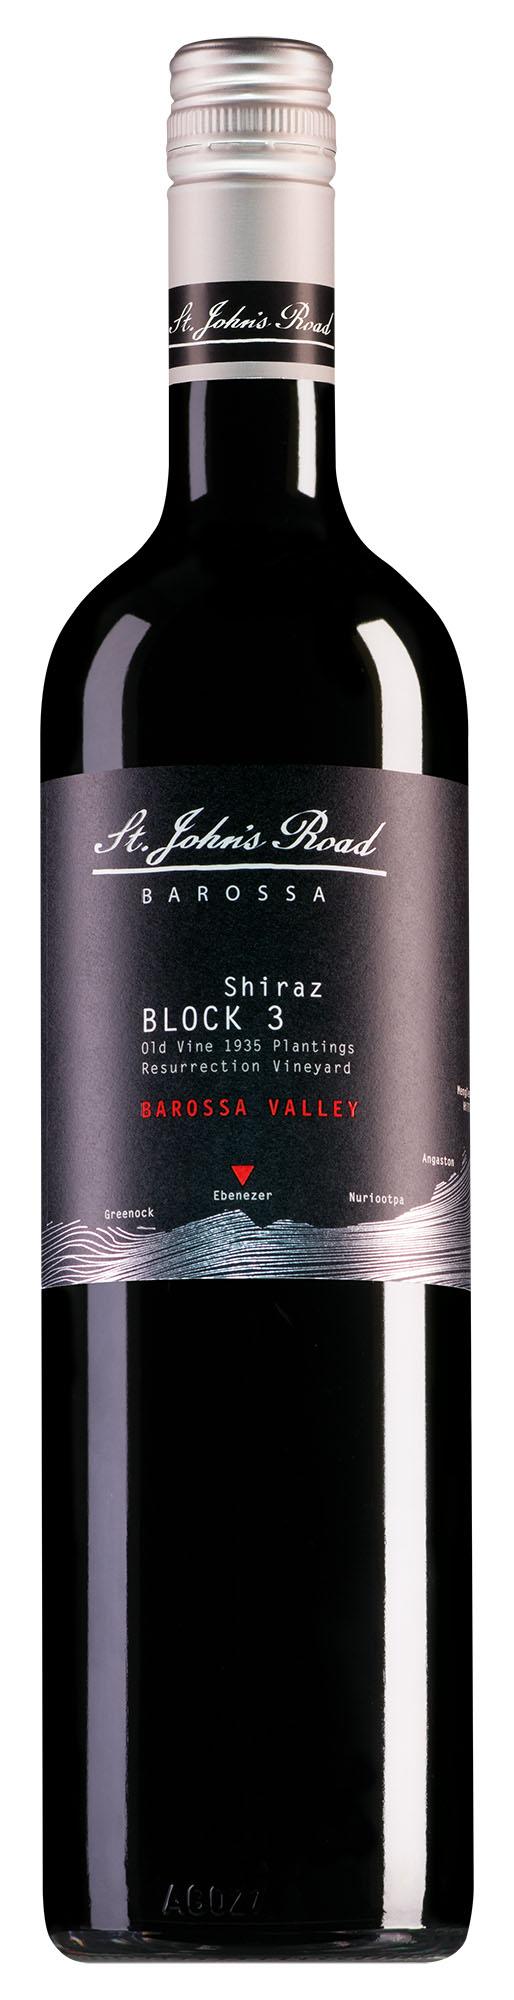 St. John's Road Barossa Valley Block 3 Shiraz